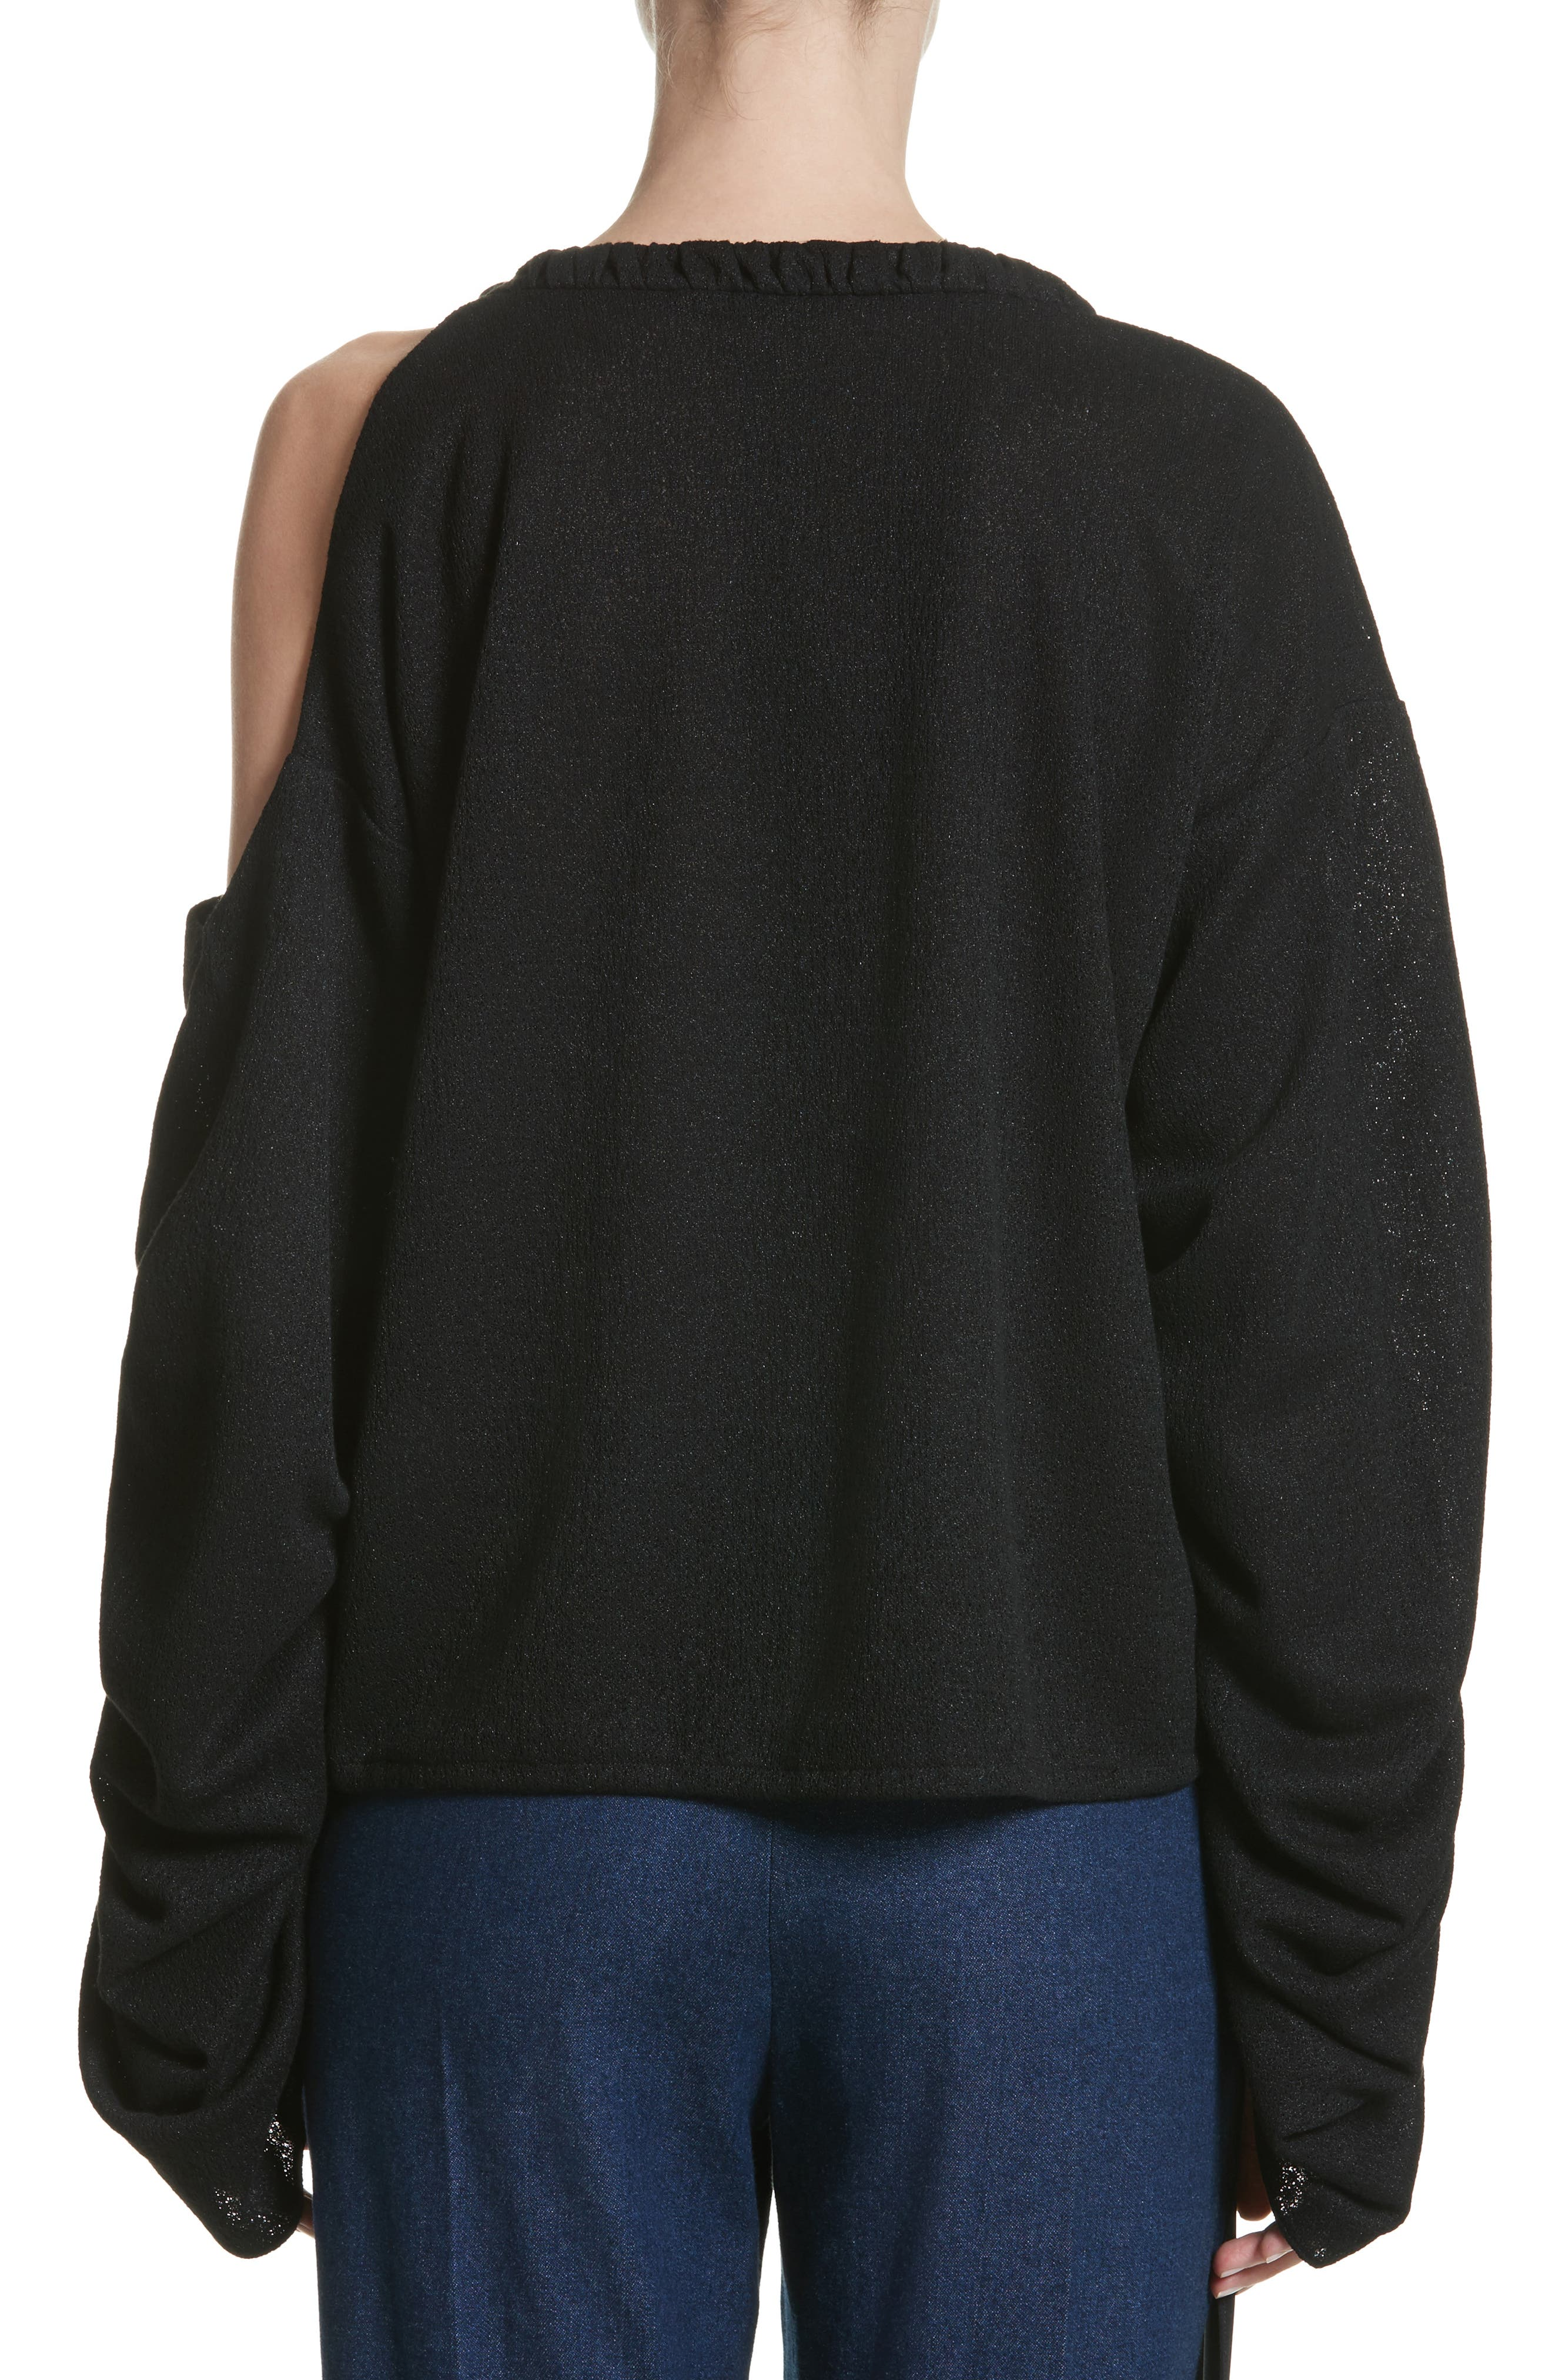 Joshua Cold Shoulder Pullover,                             Alternate thumbnail 2, color,                             Black